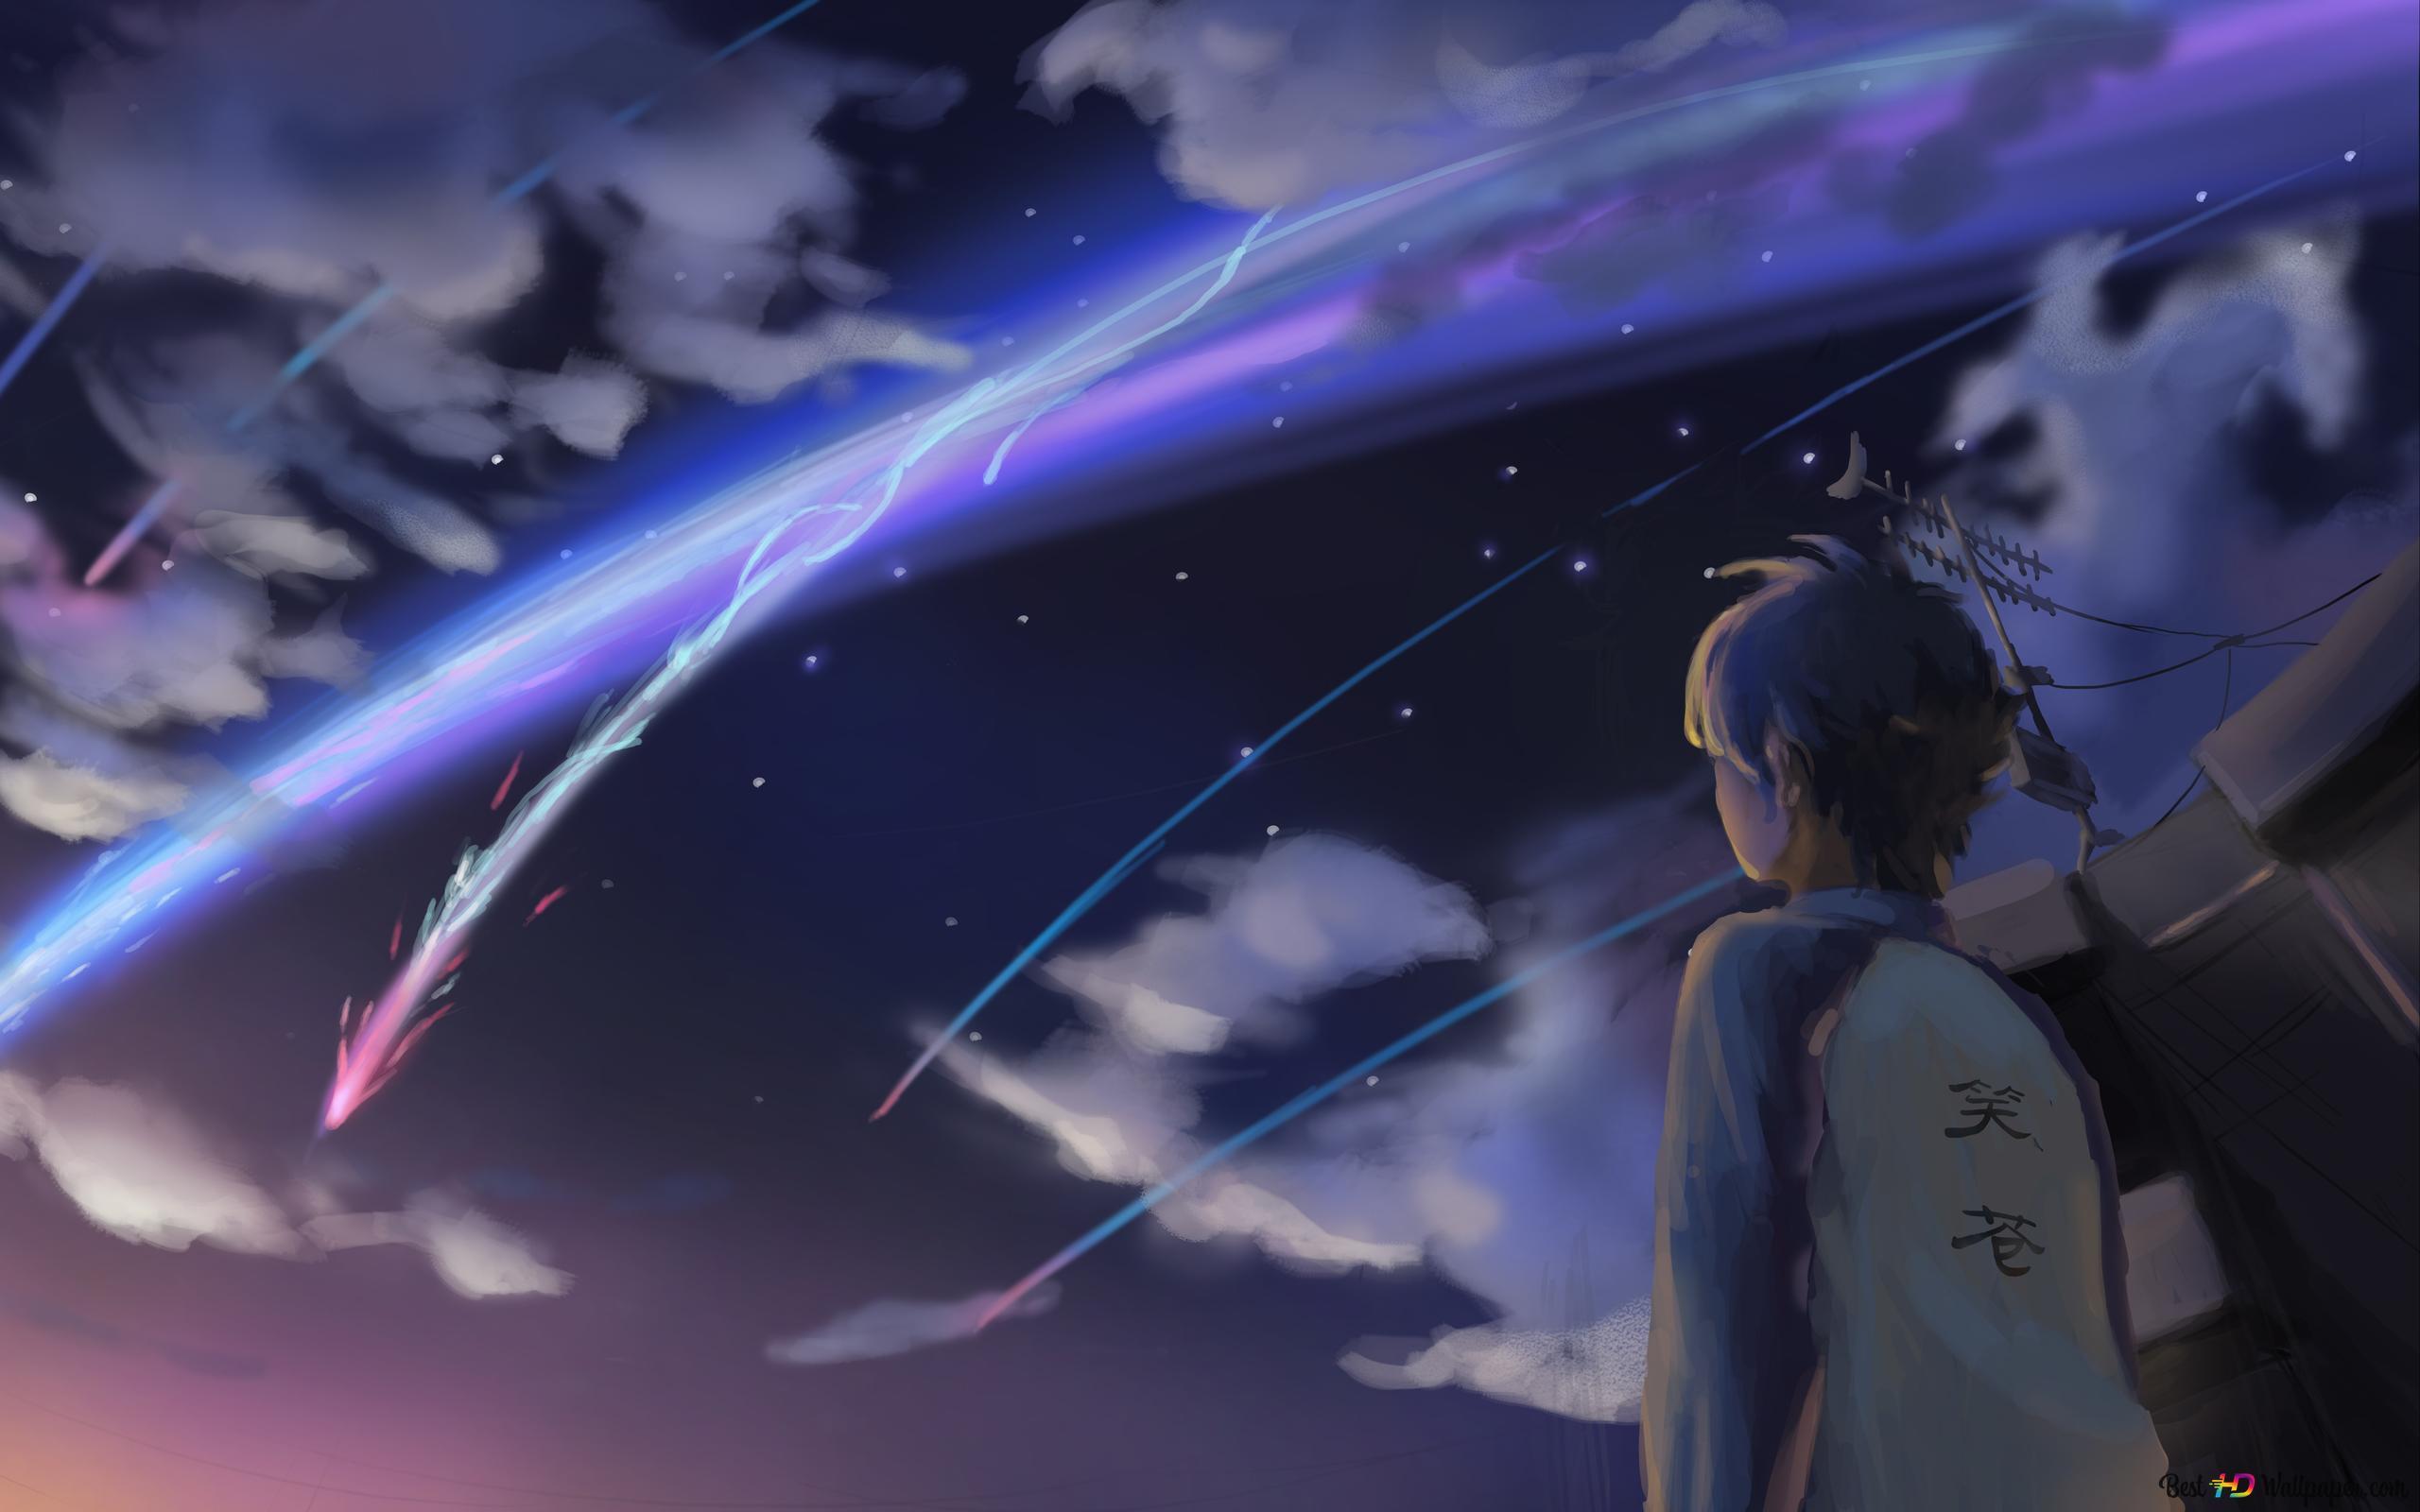 Your Name Taki Tachibana Hd Wallpaper Download